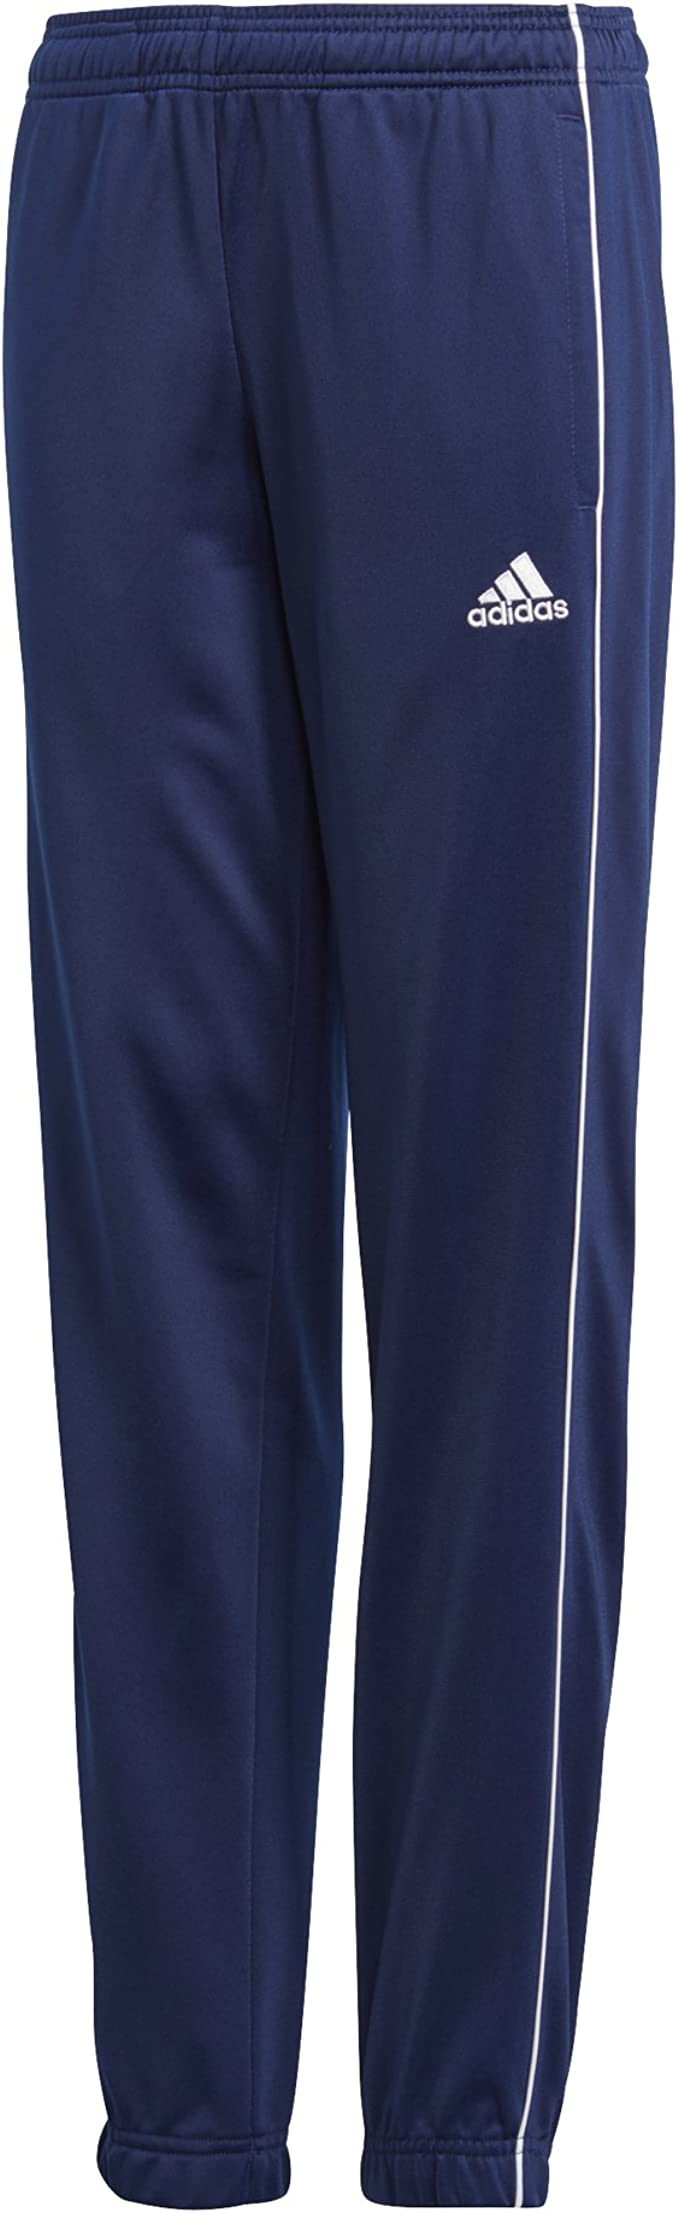 adidas Core18 PES PNTY Sport Trousers, Unisex niños: Amazon.es ...